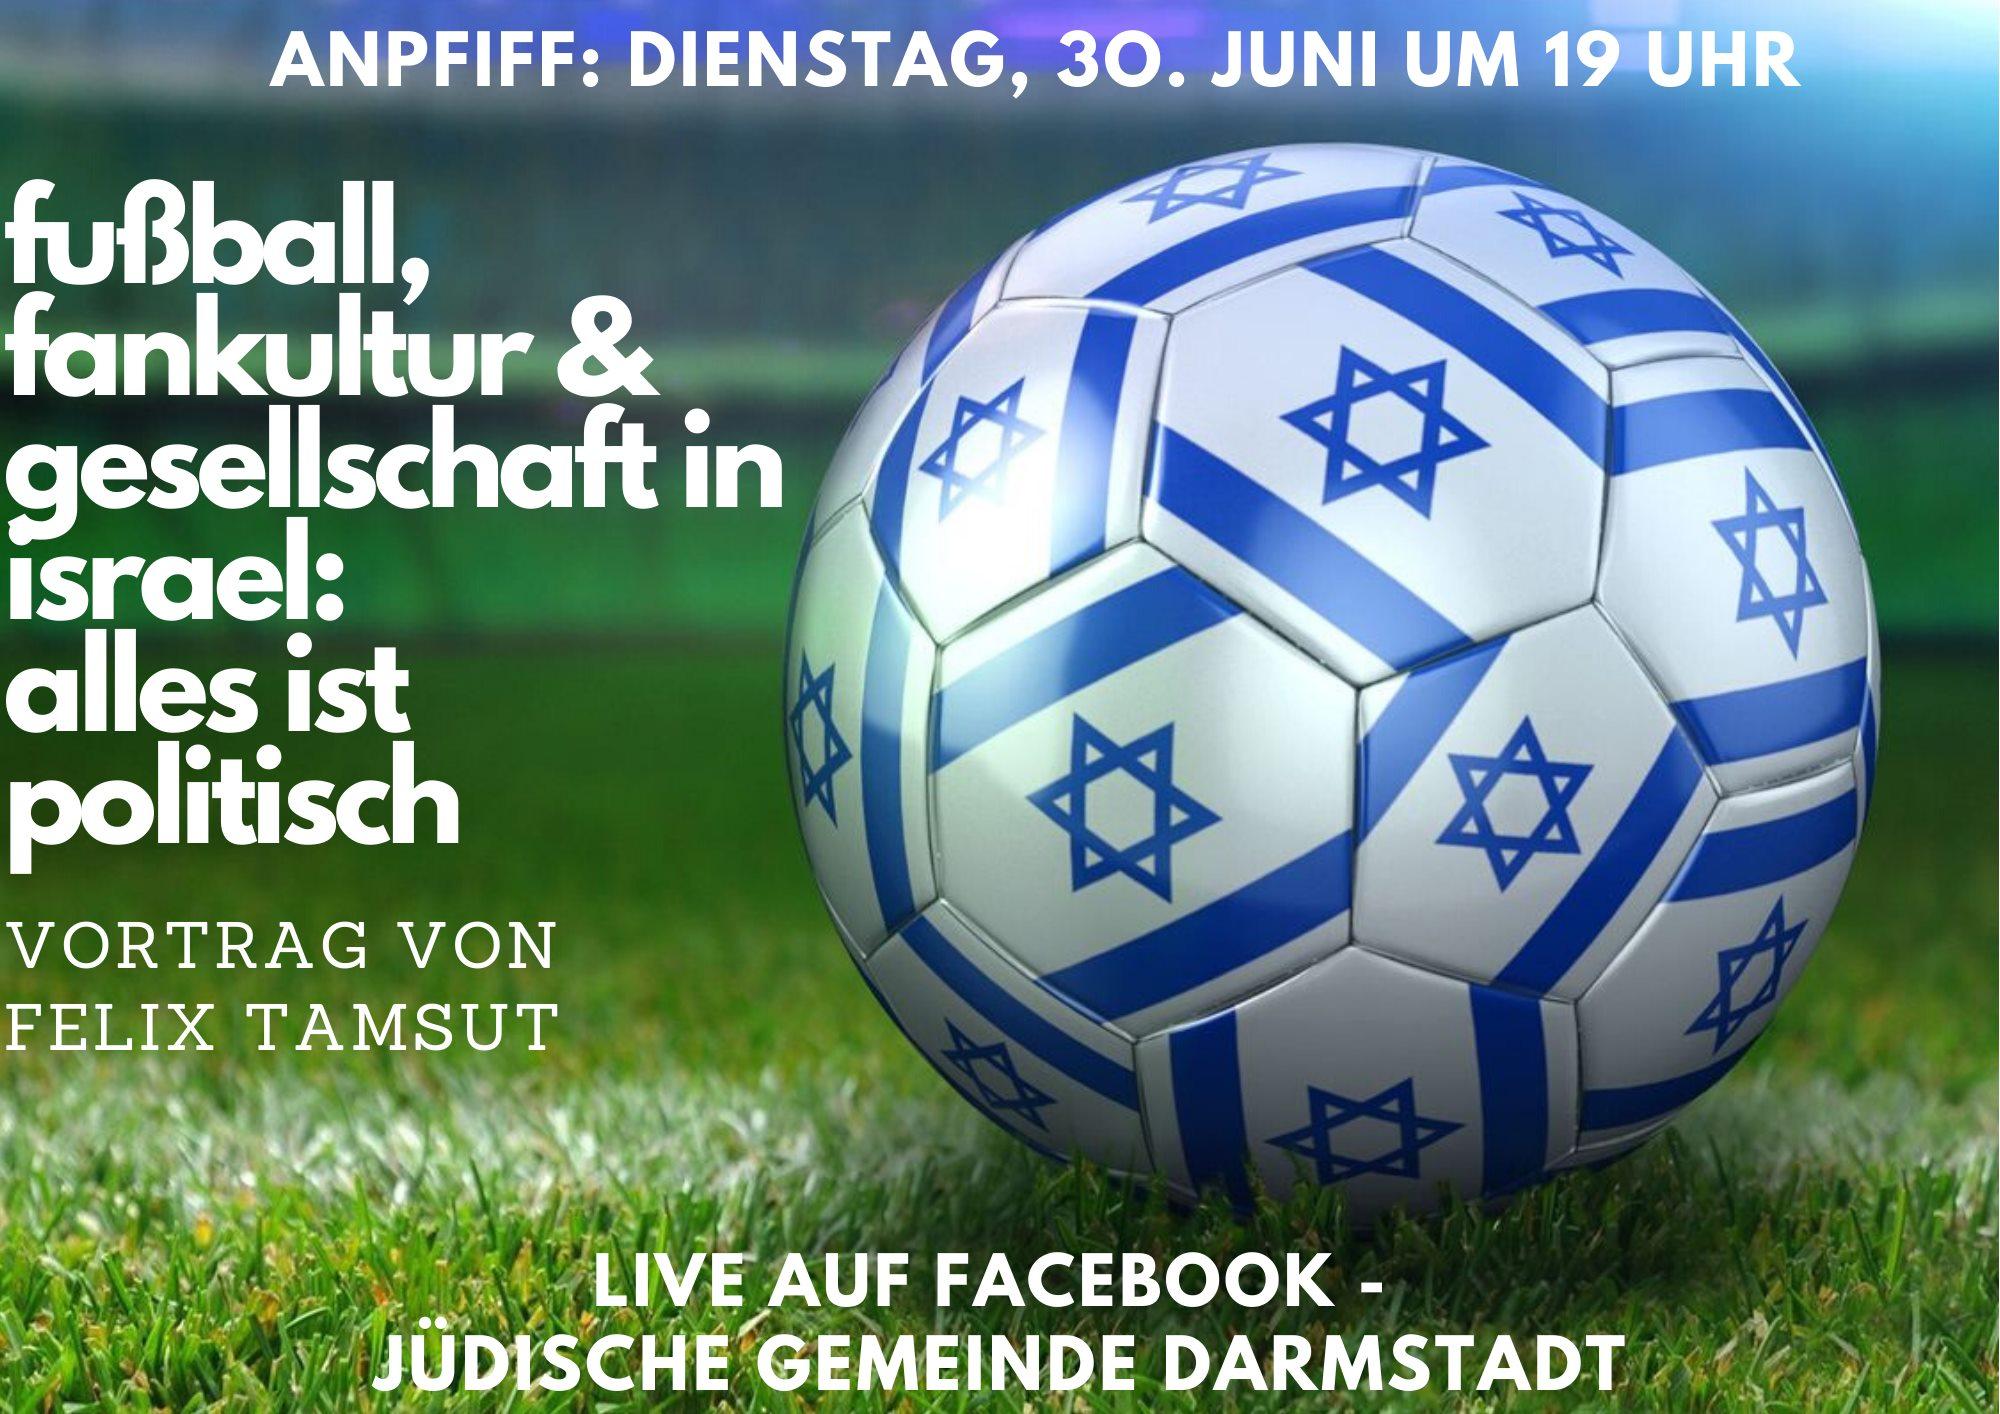 Fußball, Fankultur und Gesellschaft in Israel - LIVE @Facebook